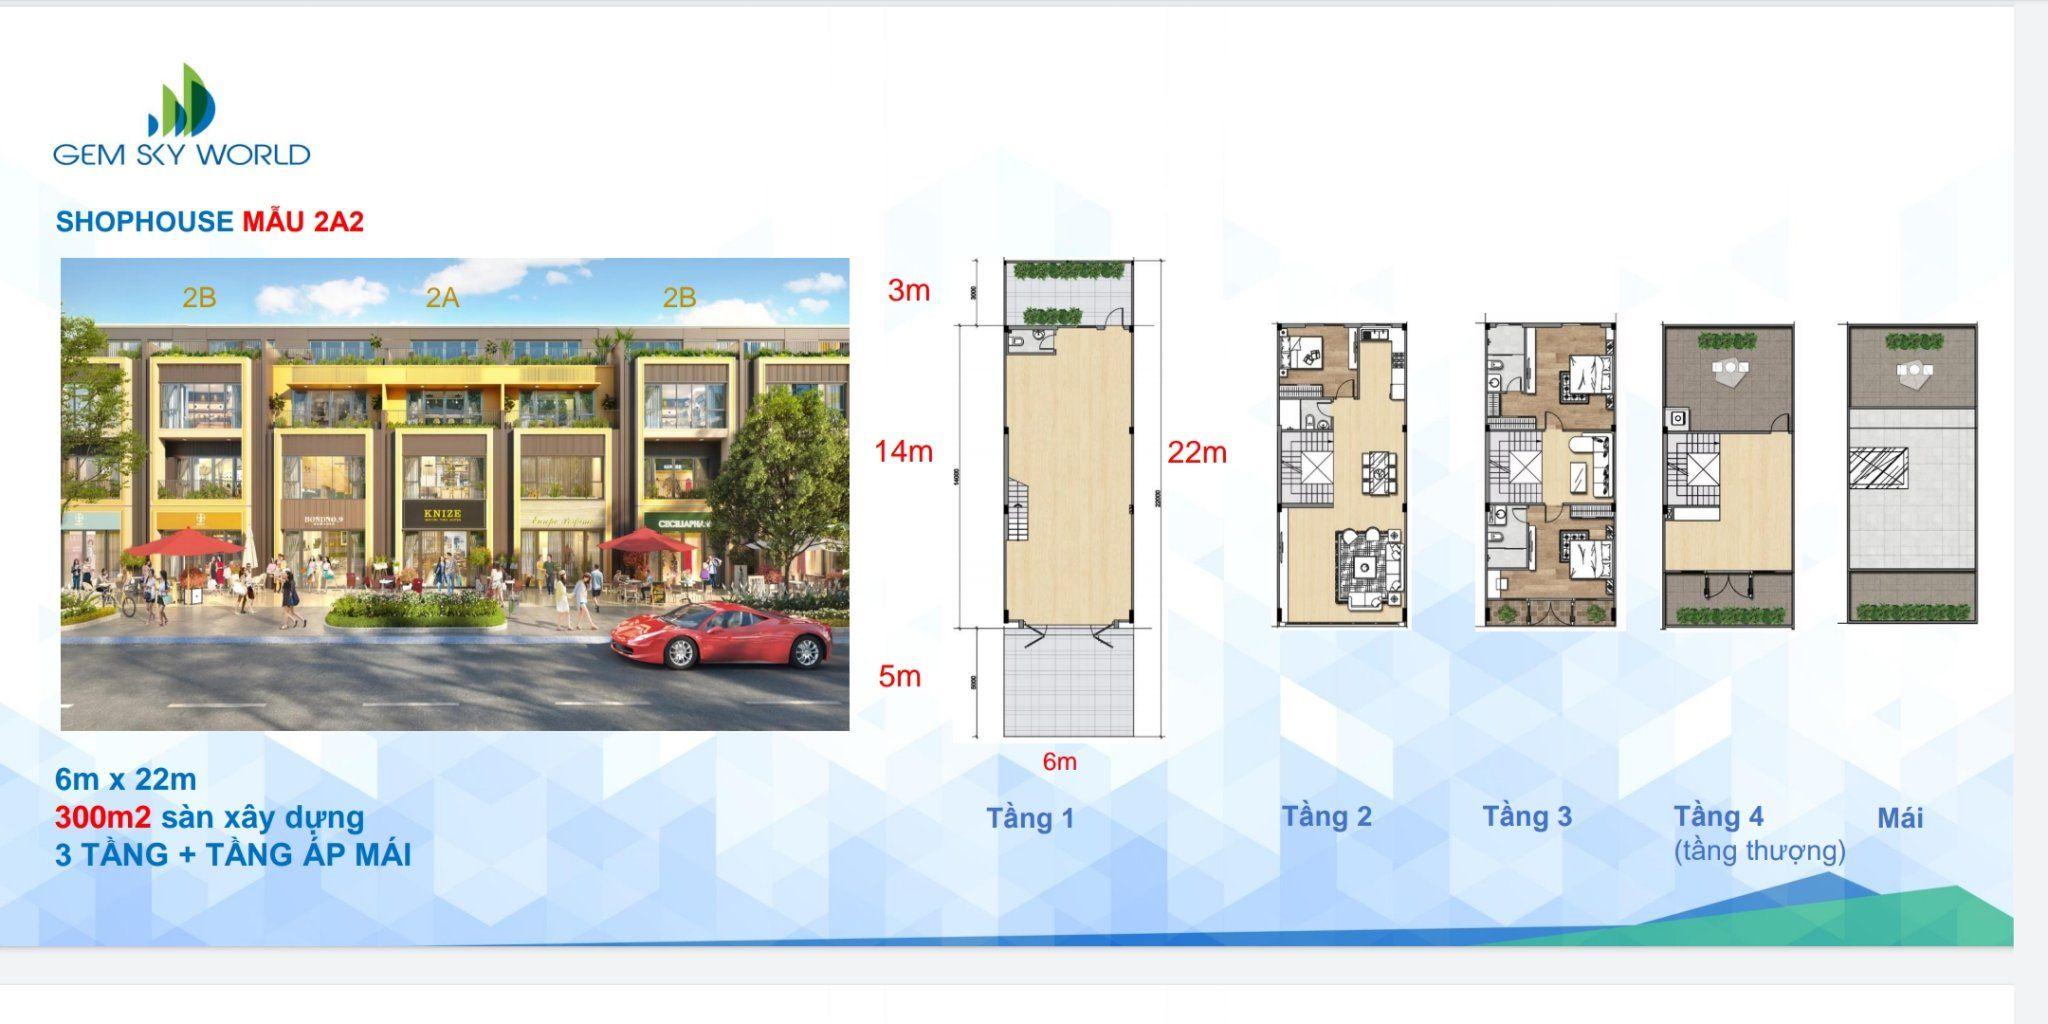 Thiết kế Shophouse dự án Gem Sky Word